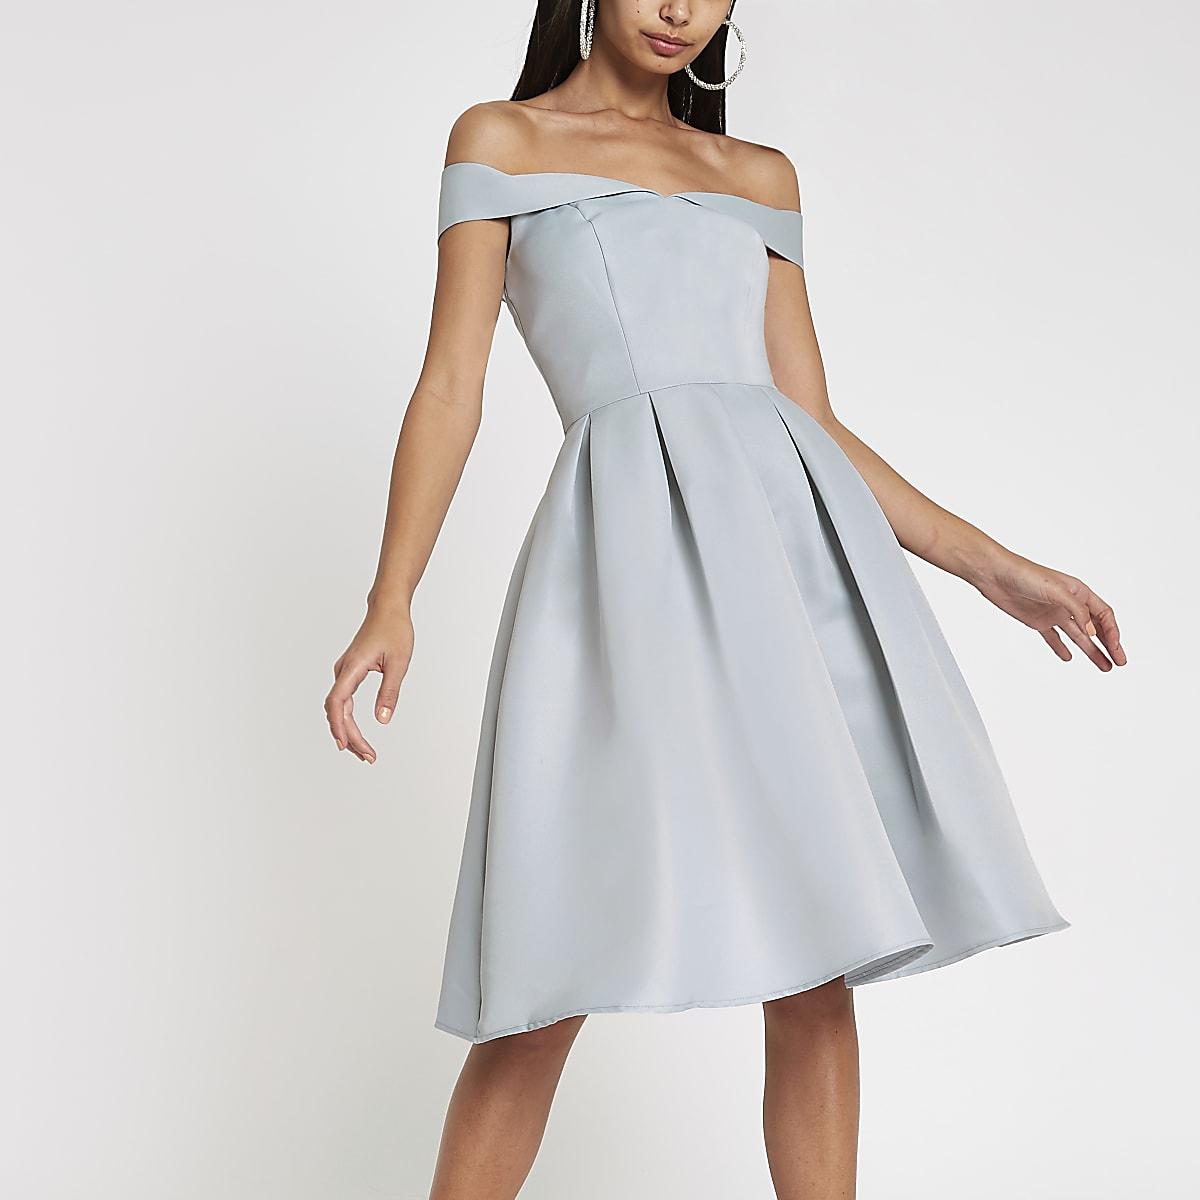 Chi Chi London blue bardot neck prom dress